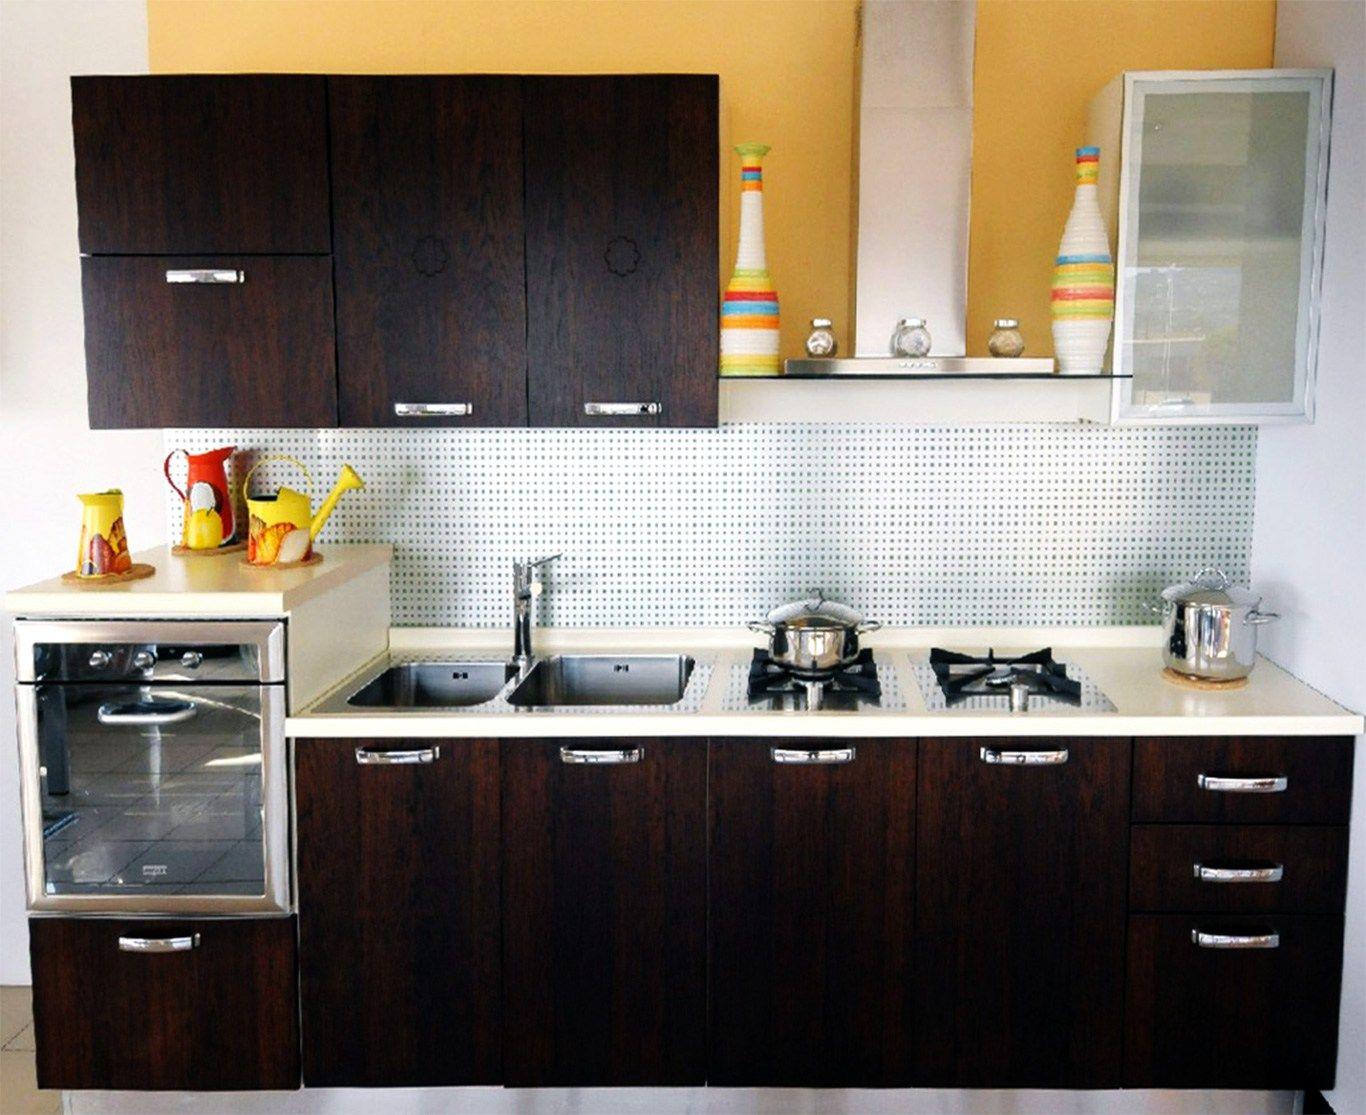 Kitchen remarkable simple kitchen cabinet designs simple build wooden basic kitchen cabinet plans plans download basic